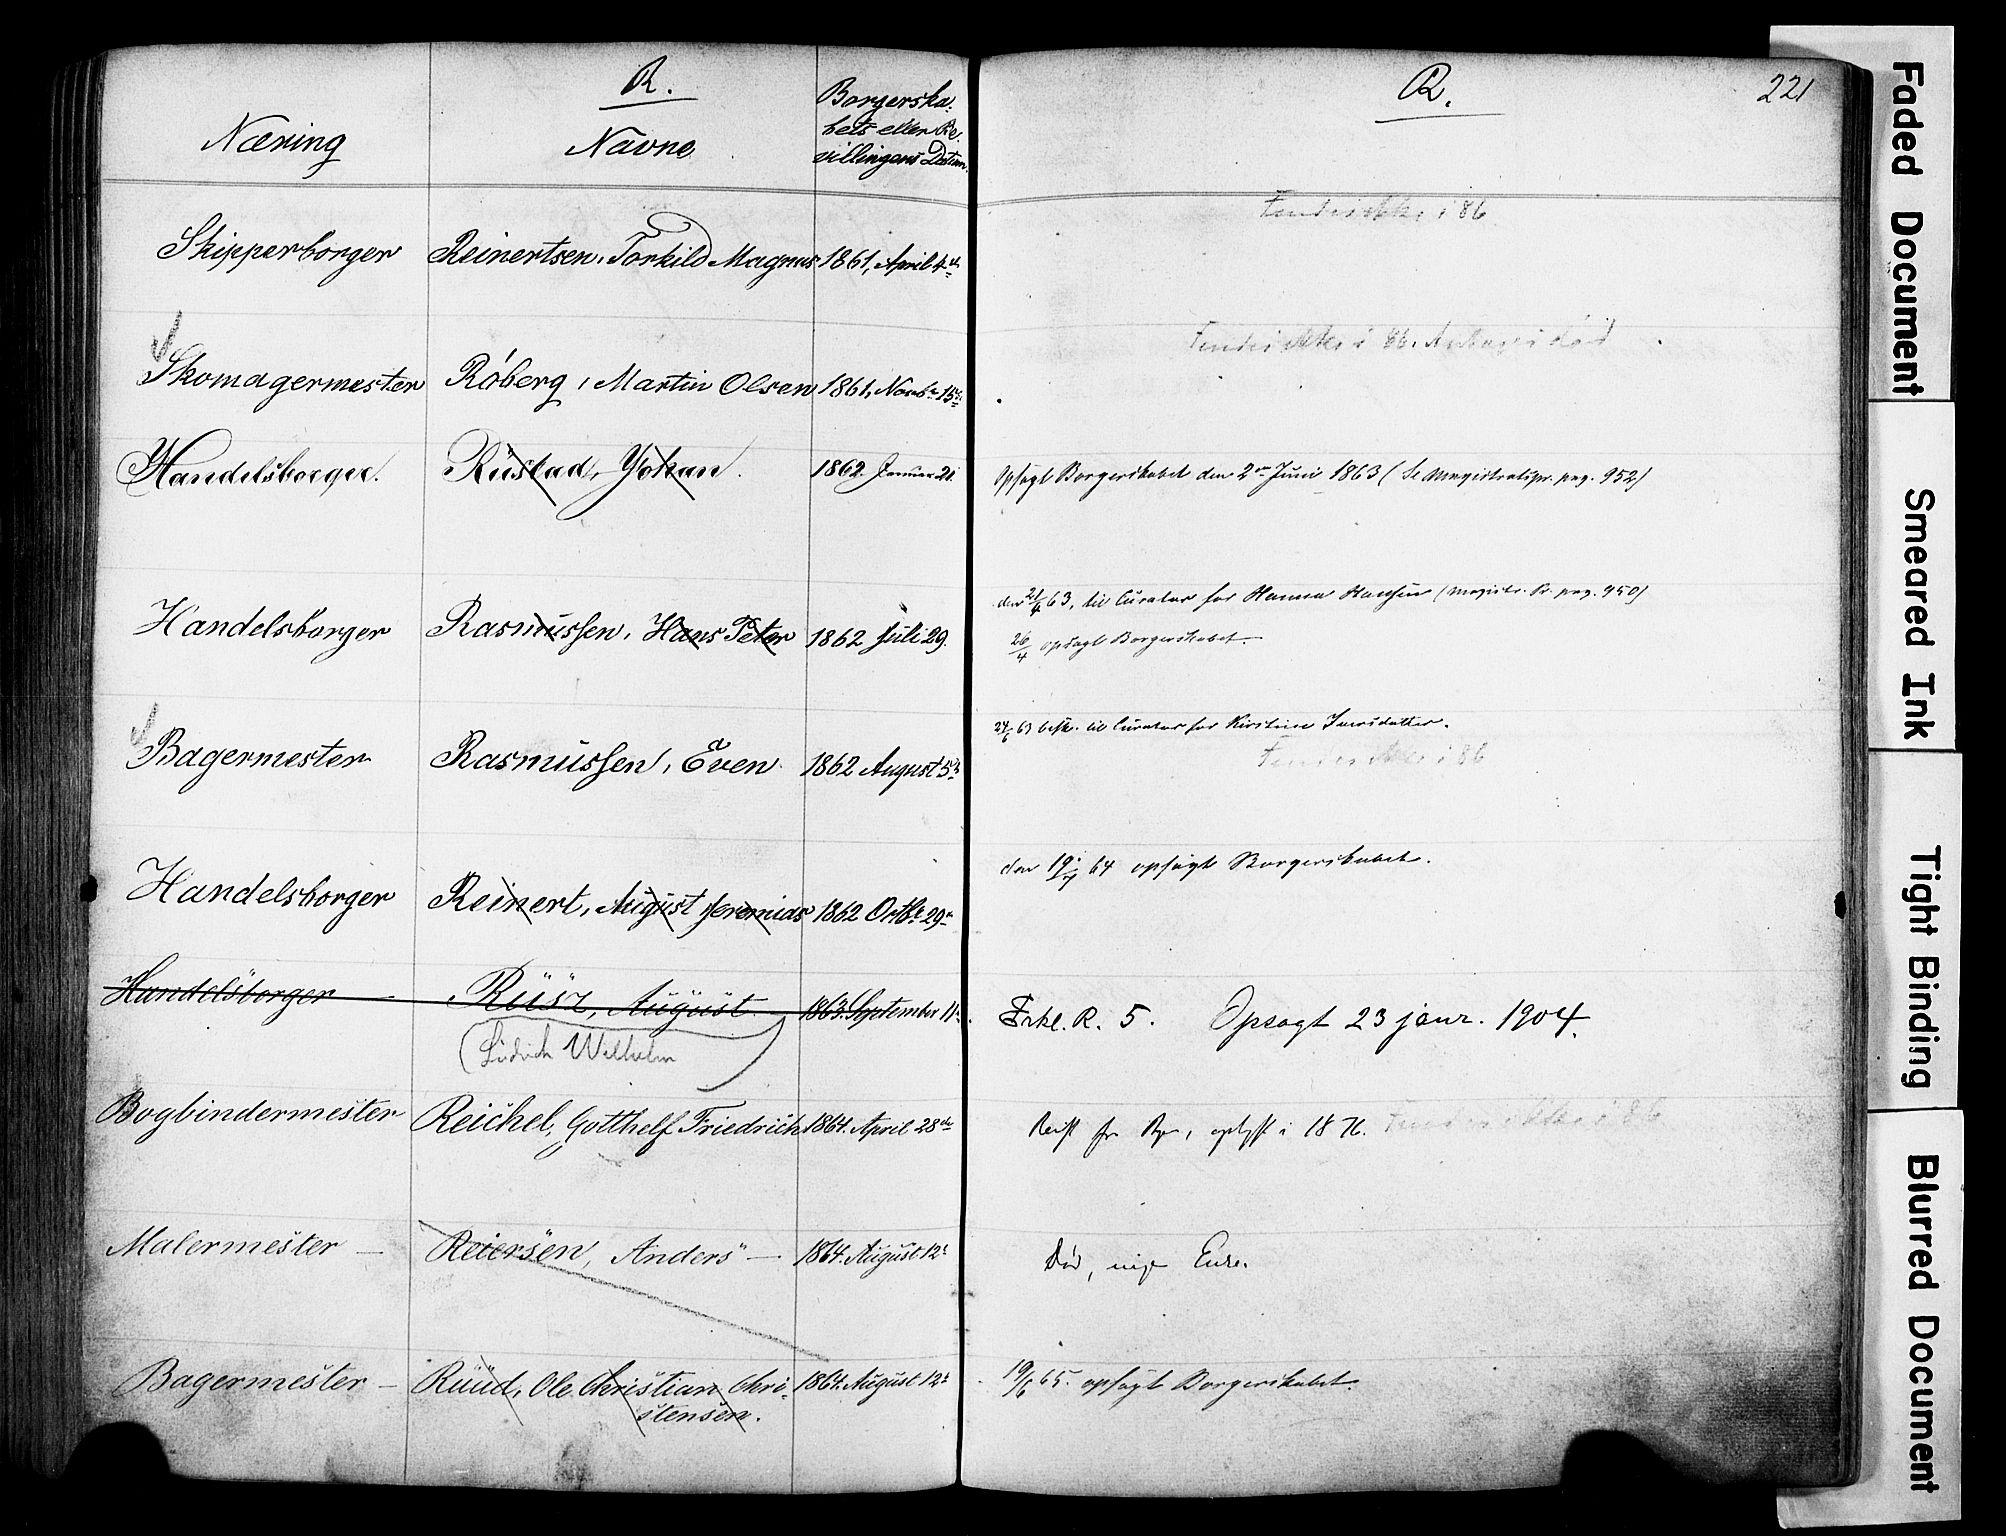 SAO, Kristiania magistrat, F/Fb/L0004: Borgerrulle, 1860-1879, s. 223